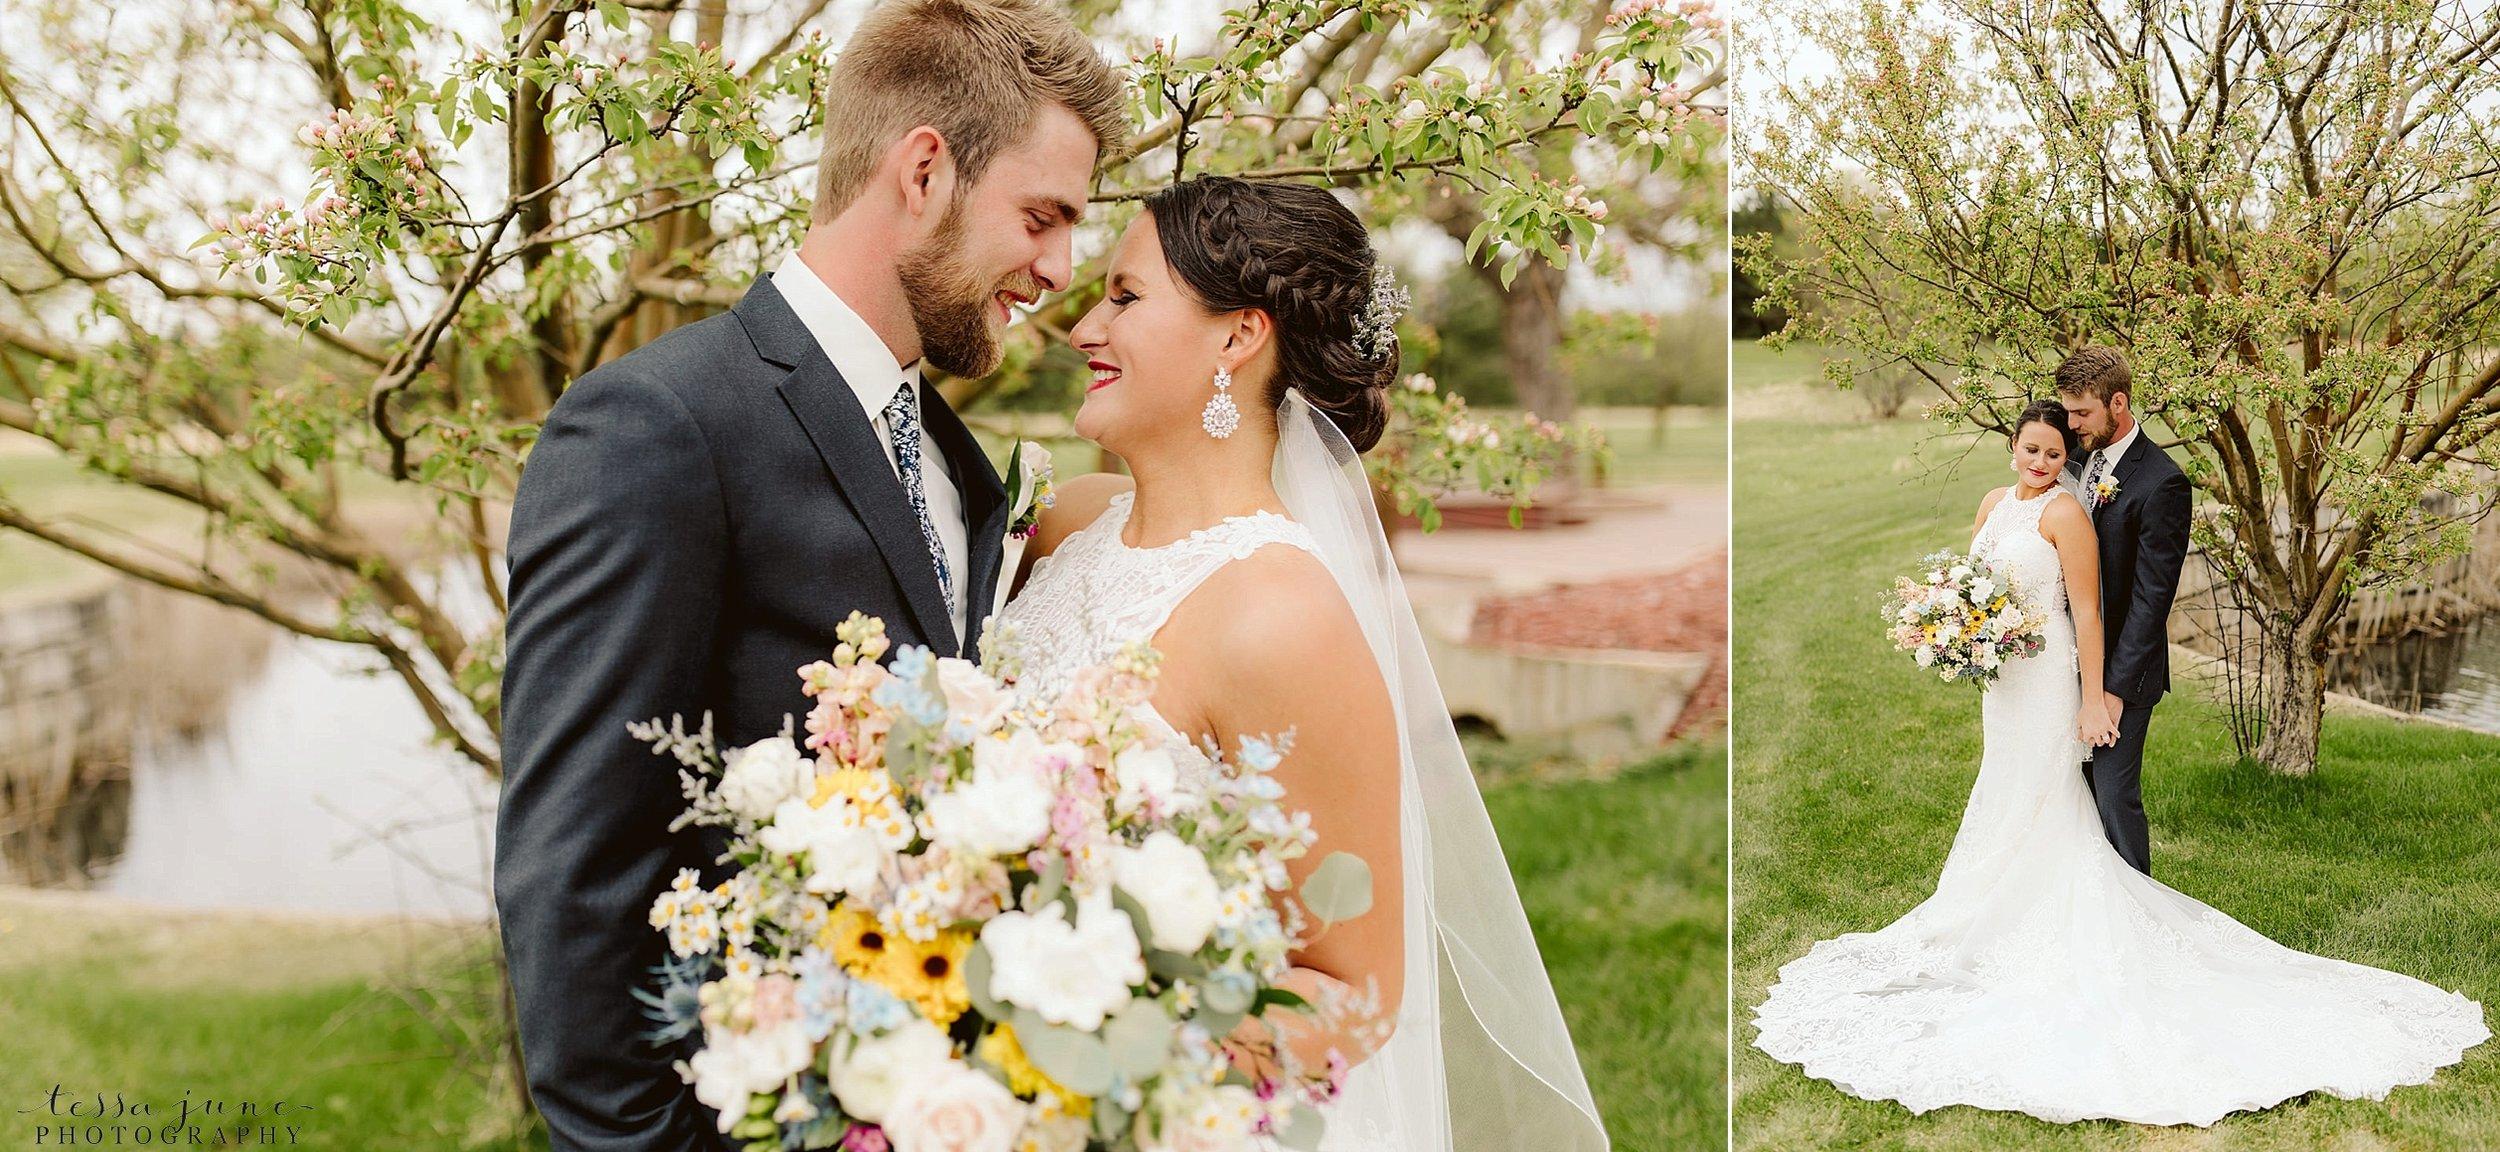 The-grands-at-mulligans-wedding-sartell-minnesota-spring-floral-spring-garden-wedding-52.jpg